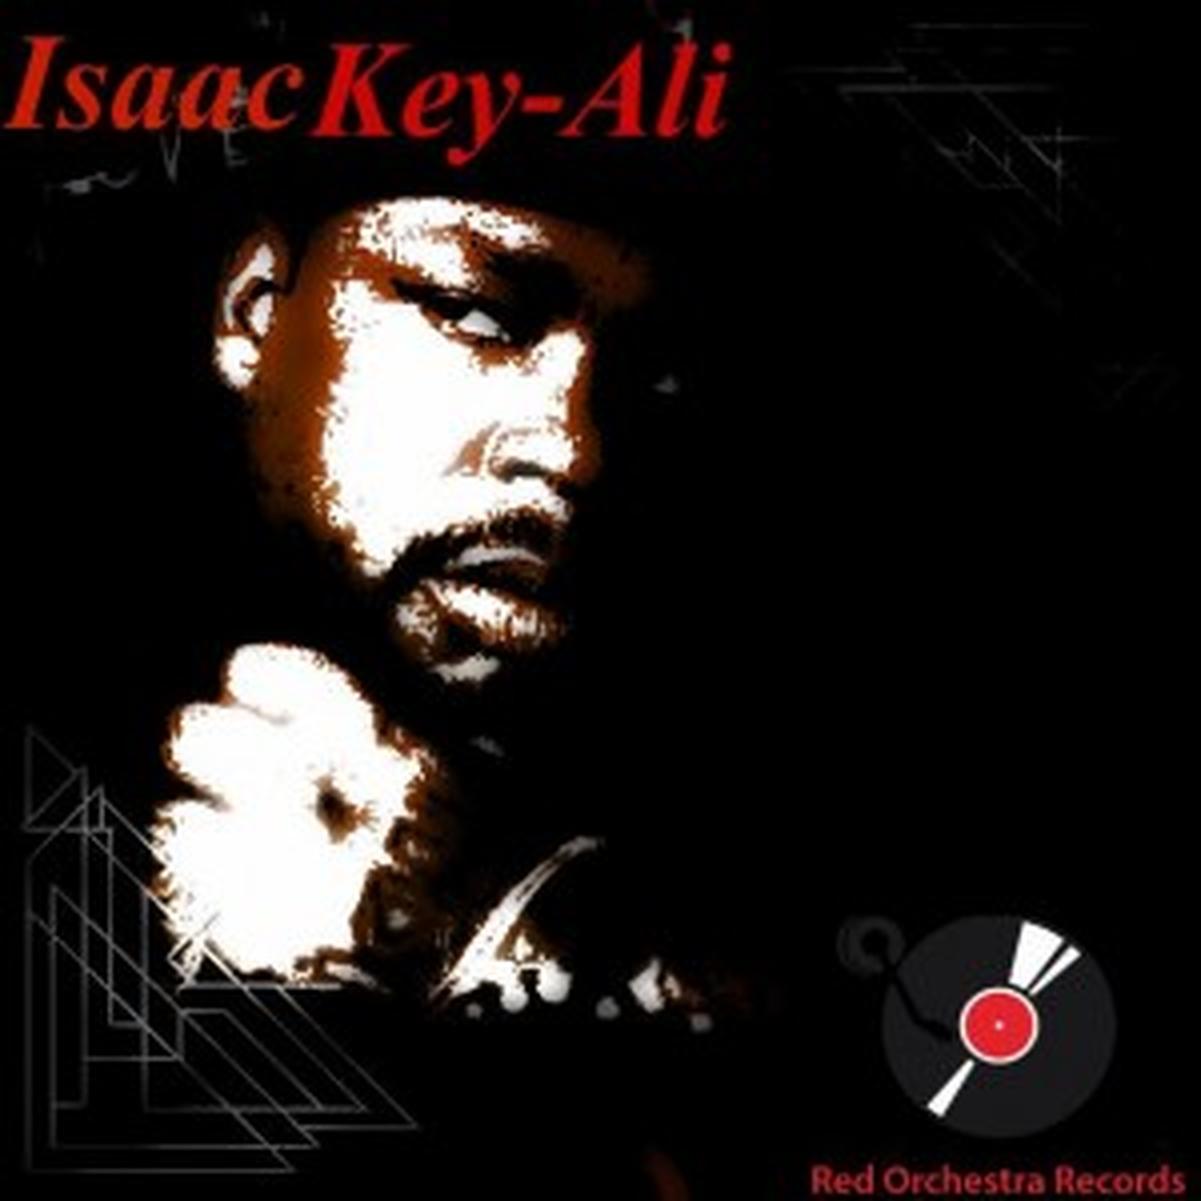 Isaac Key-Ali